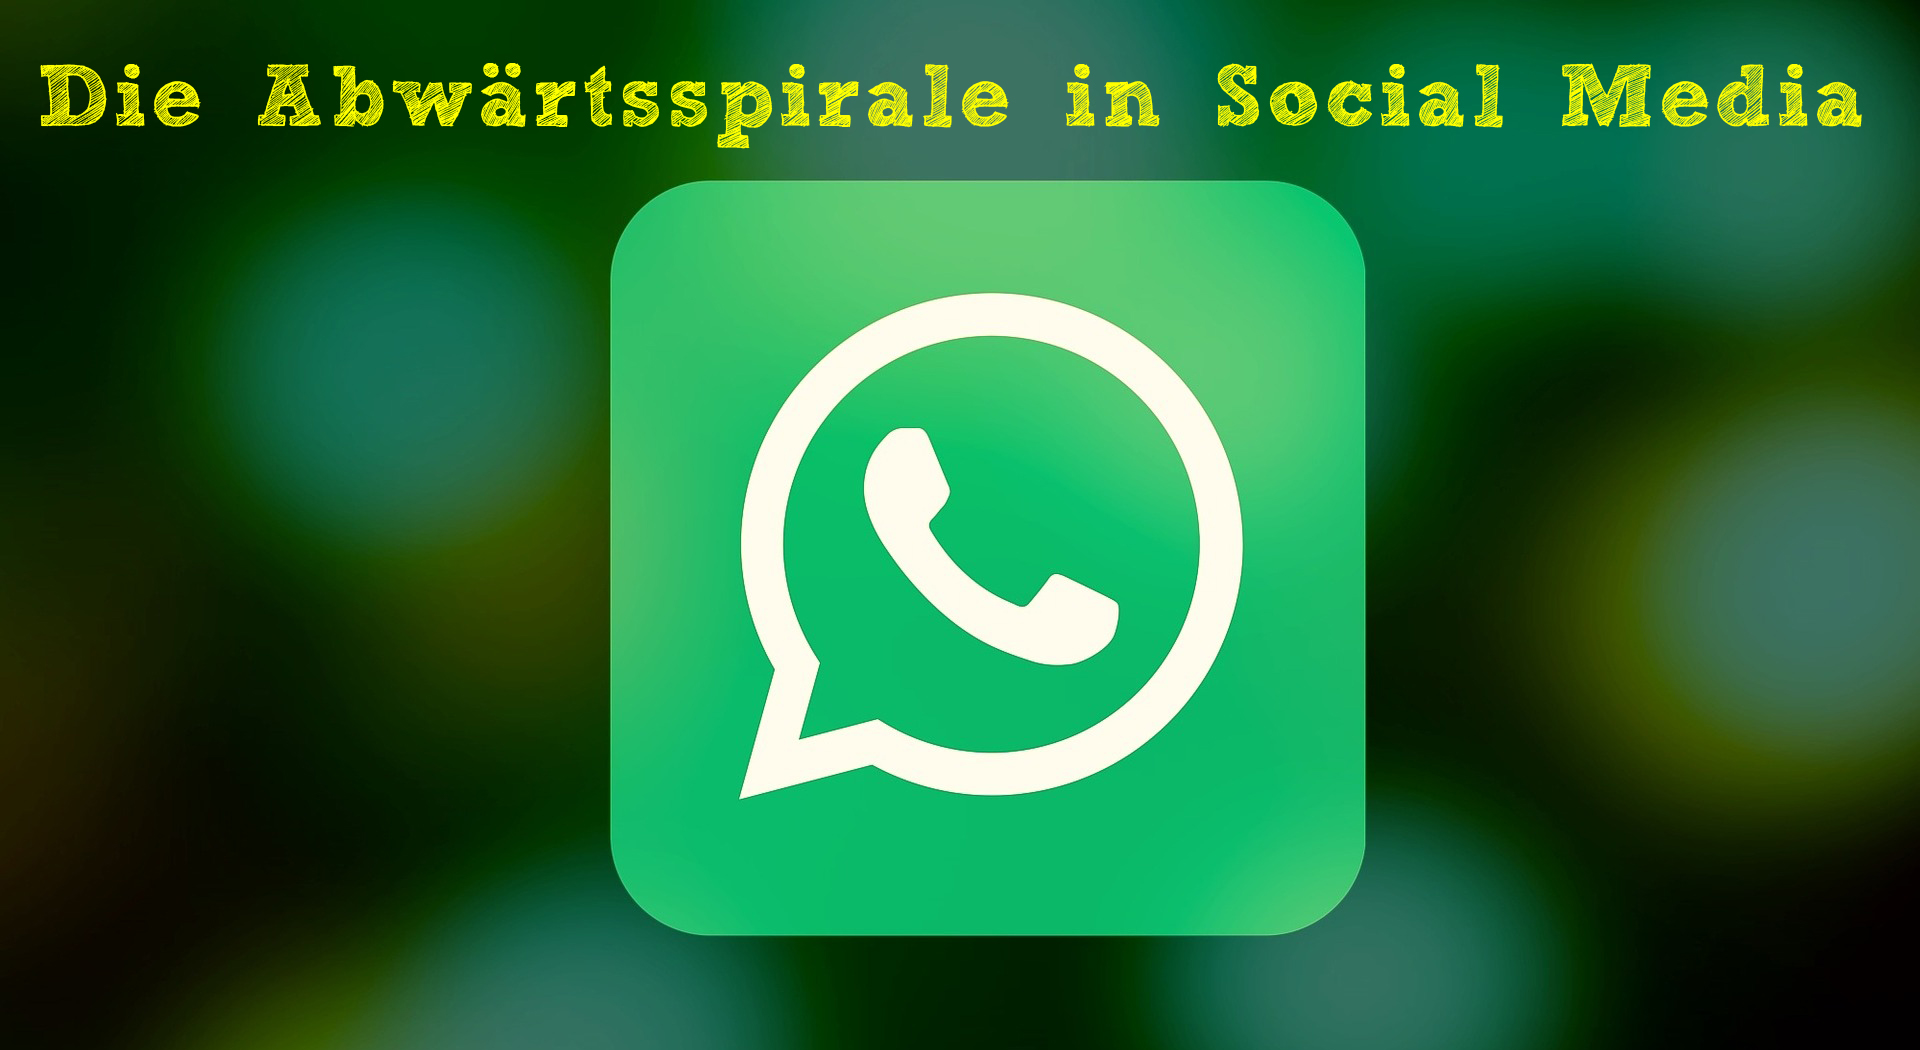 Die Abwärtsspirale in Social Media